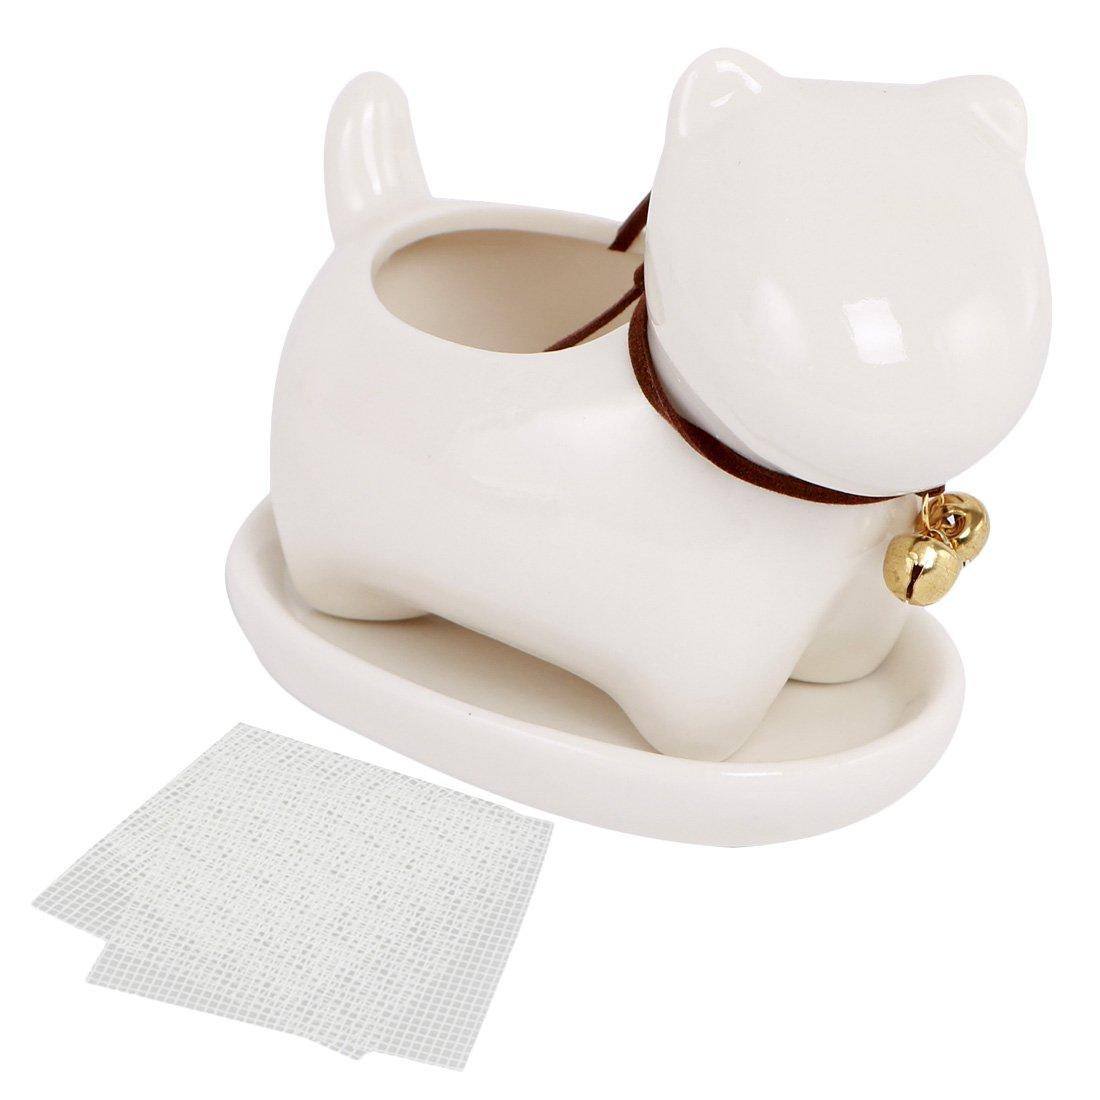 Happy Bonsai Small Ceramic Dog, Succulent Planter Pot, Saucer + 2 Mesh Screens